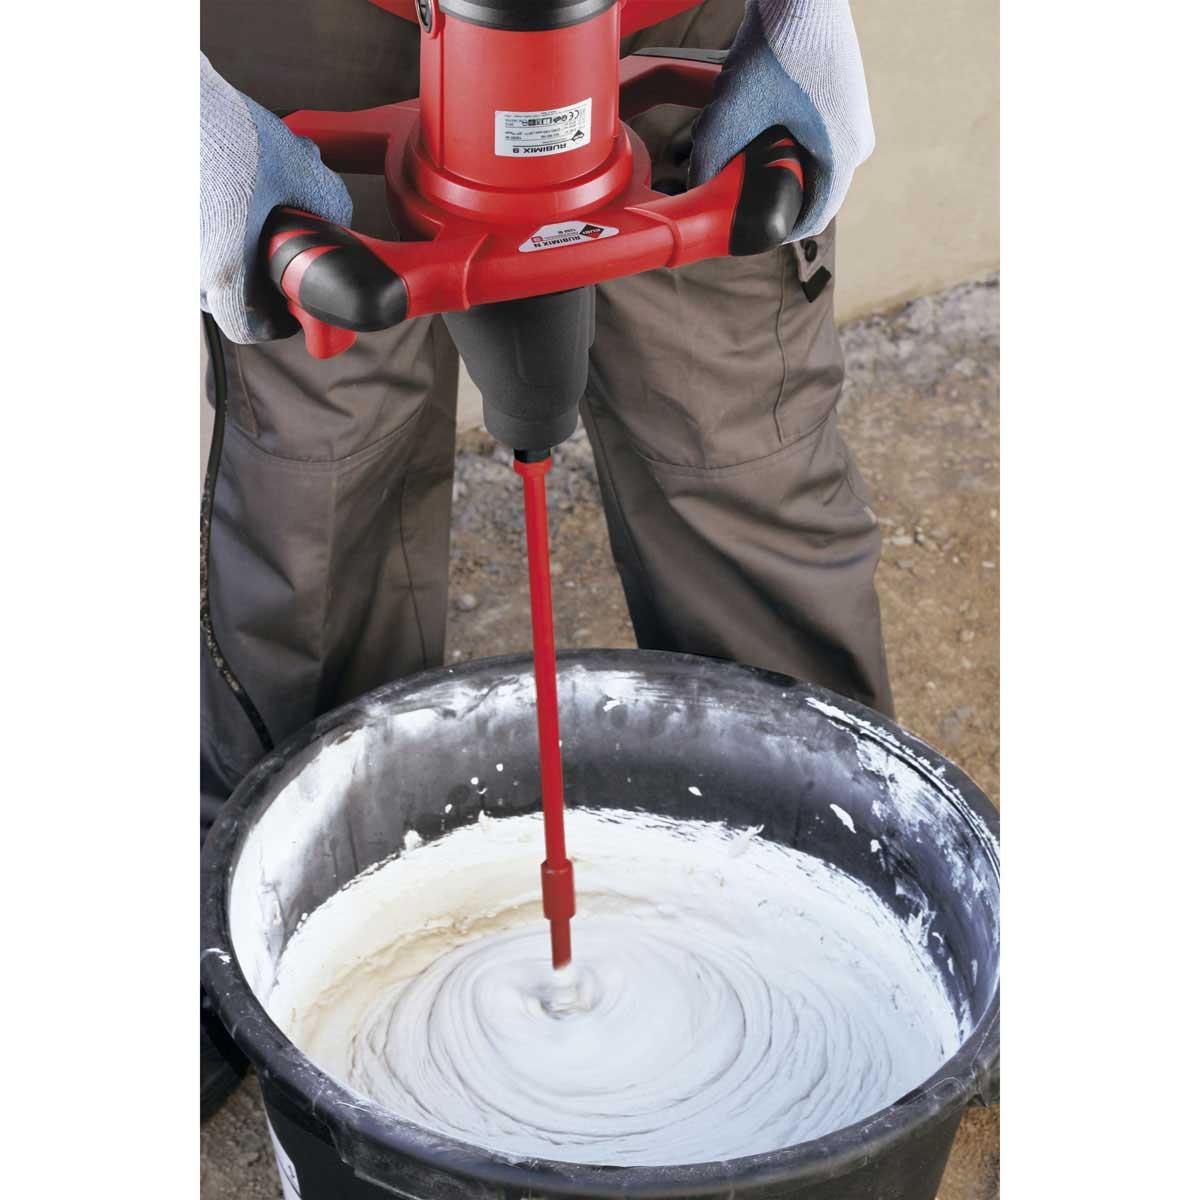 Rubimix 9-N Electric mortar mixer